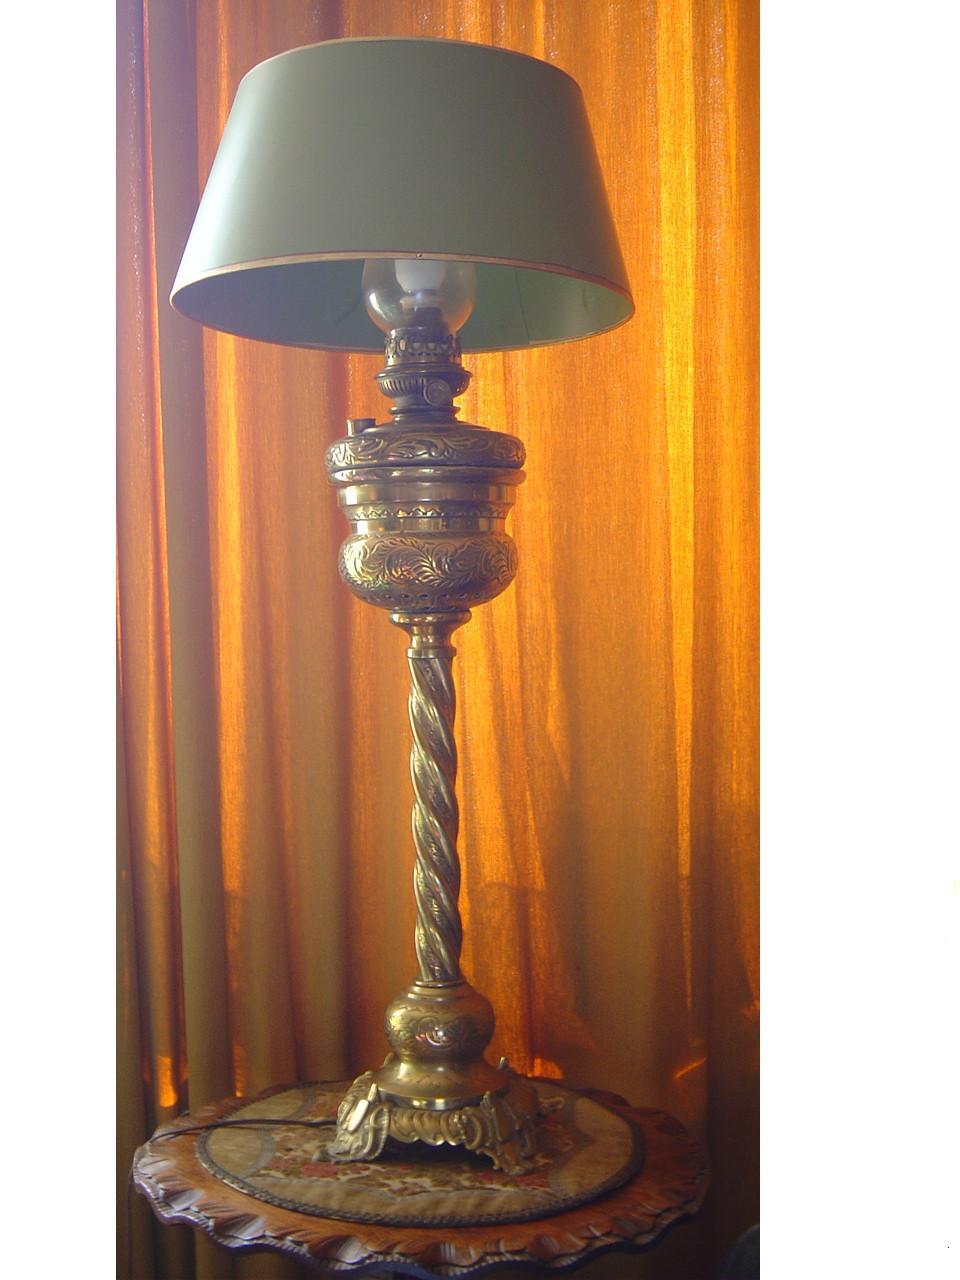 fichier lampe huile en dinanderie vers 1860 jpg wikip dia. Black Bedroom Furniture Sets. Home Design Ideas